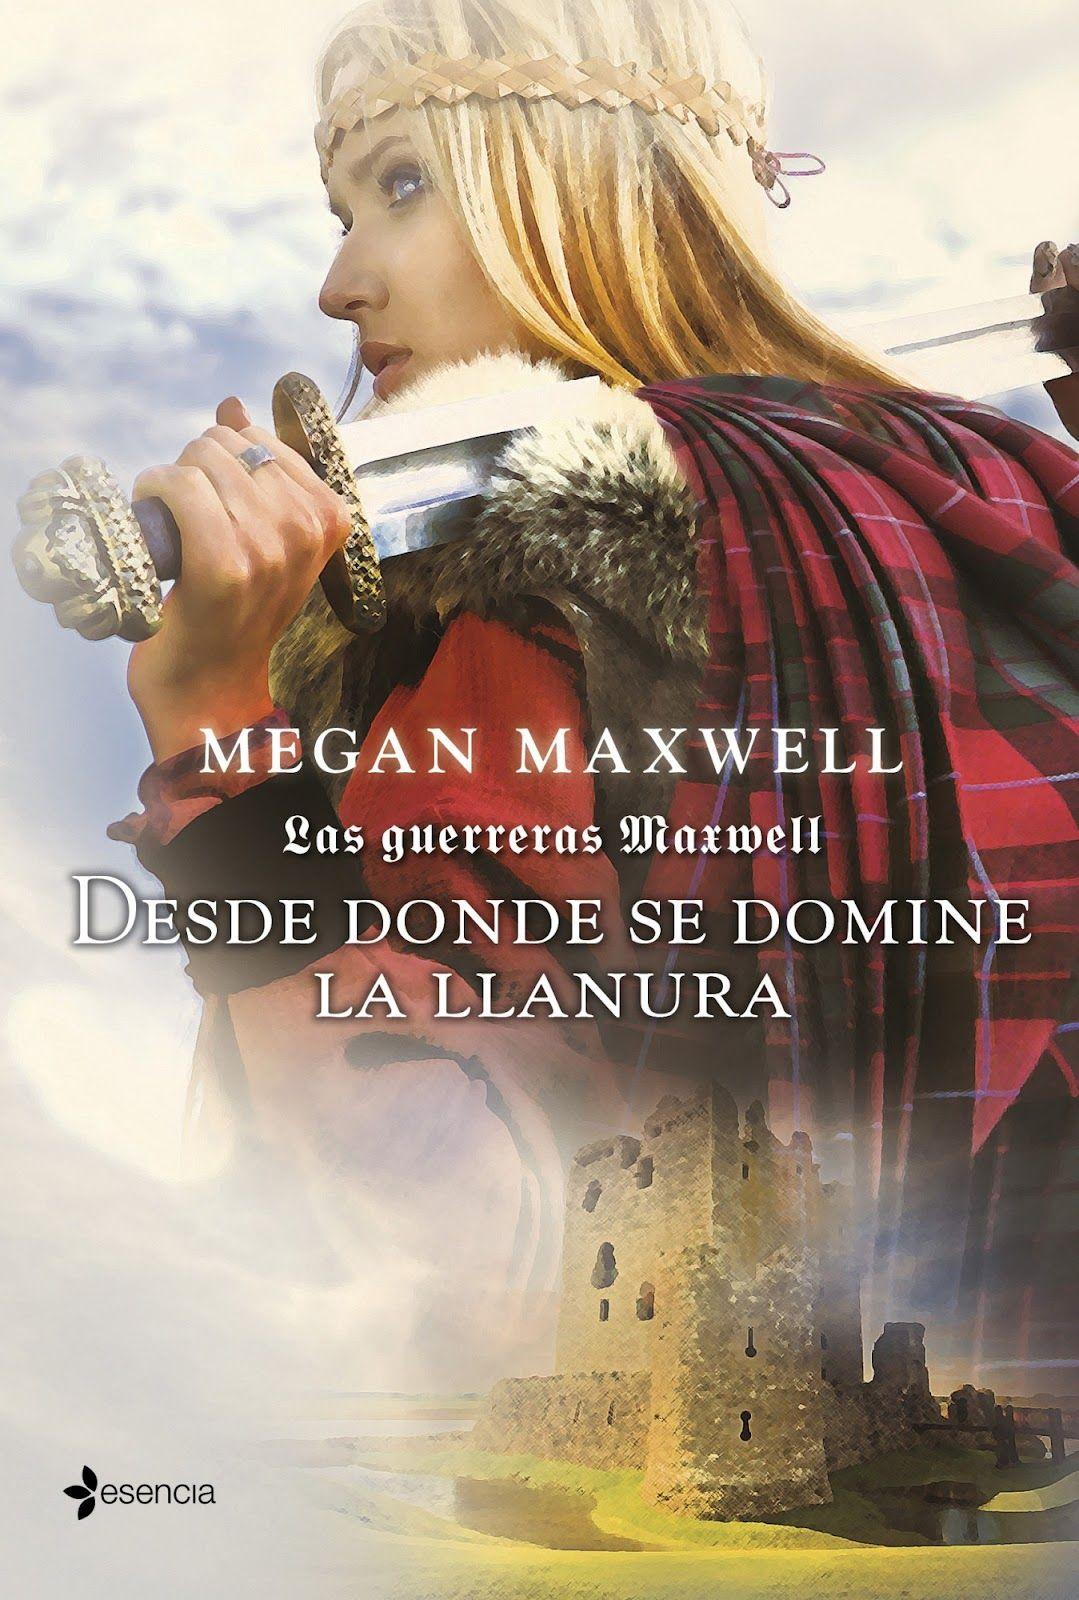 Reseña Siempre Te Encontraré Megan Maxwell Megan Maxwell Libros Gratis Epub Maxwell